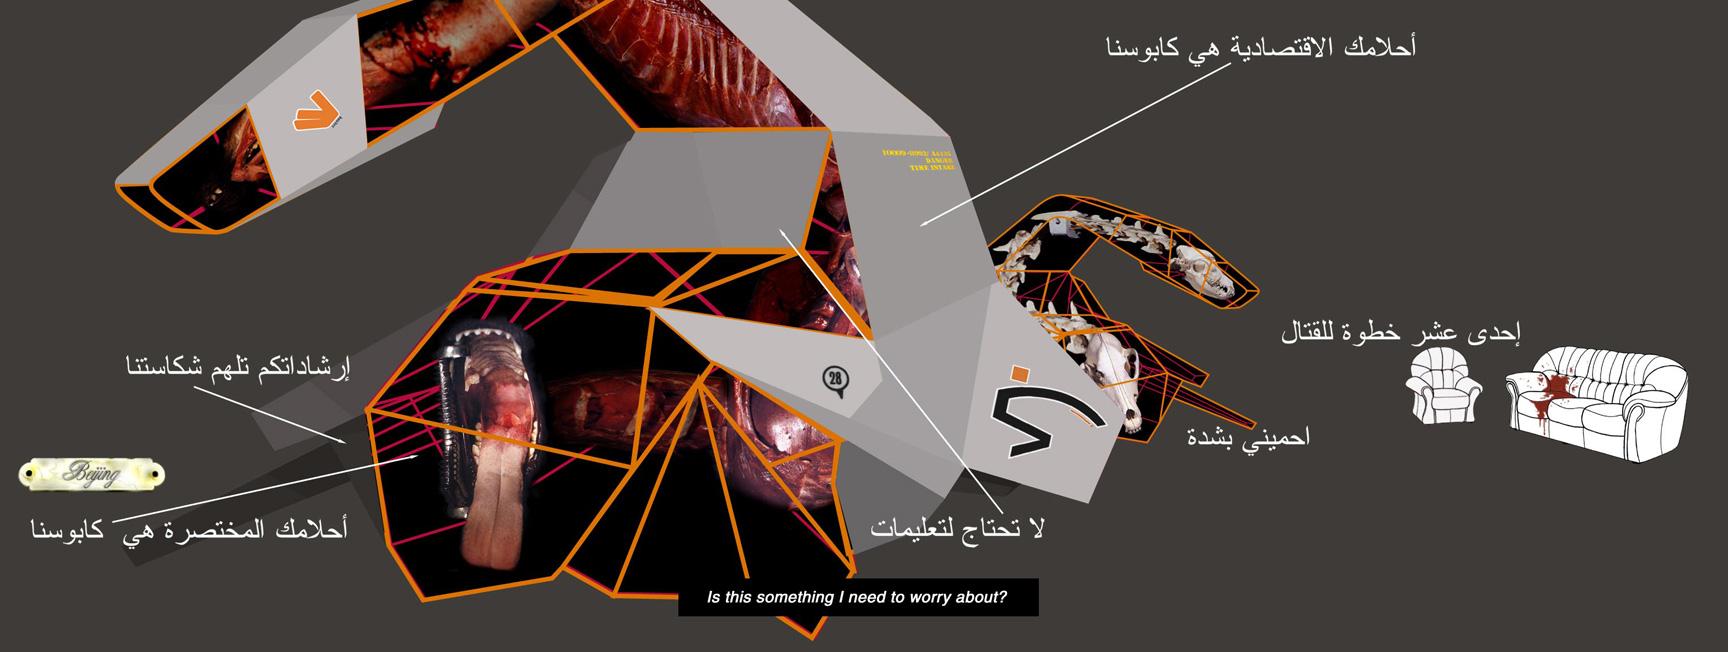 future_003_thumb.jpg